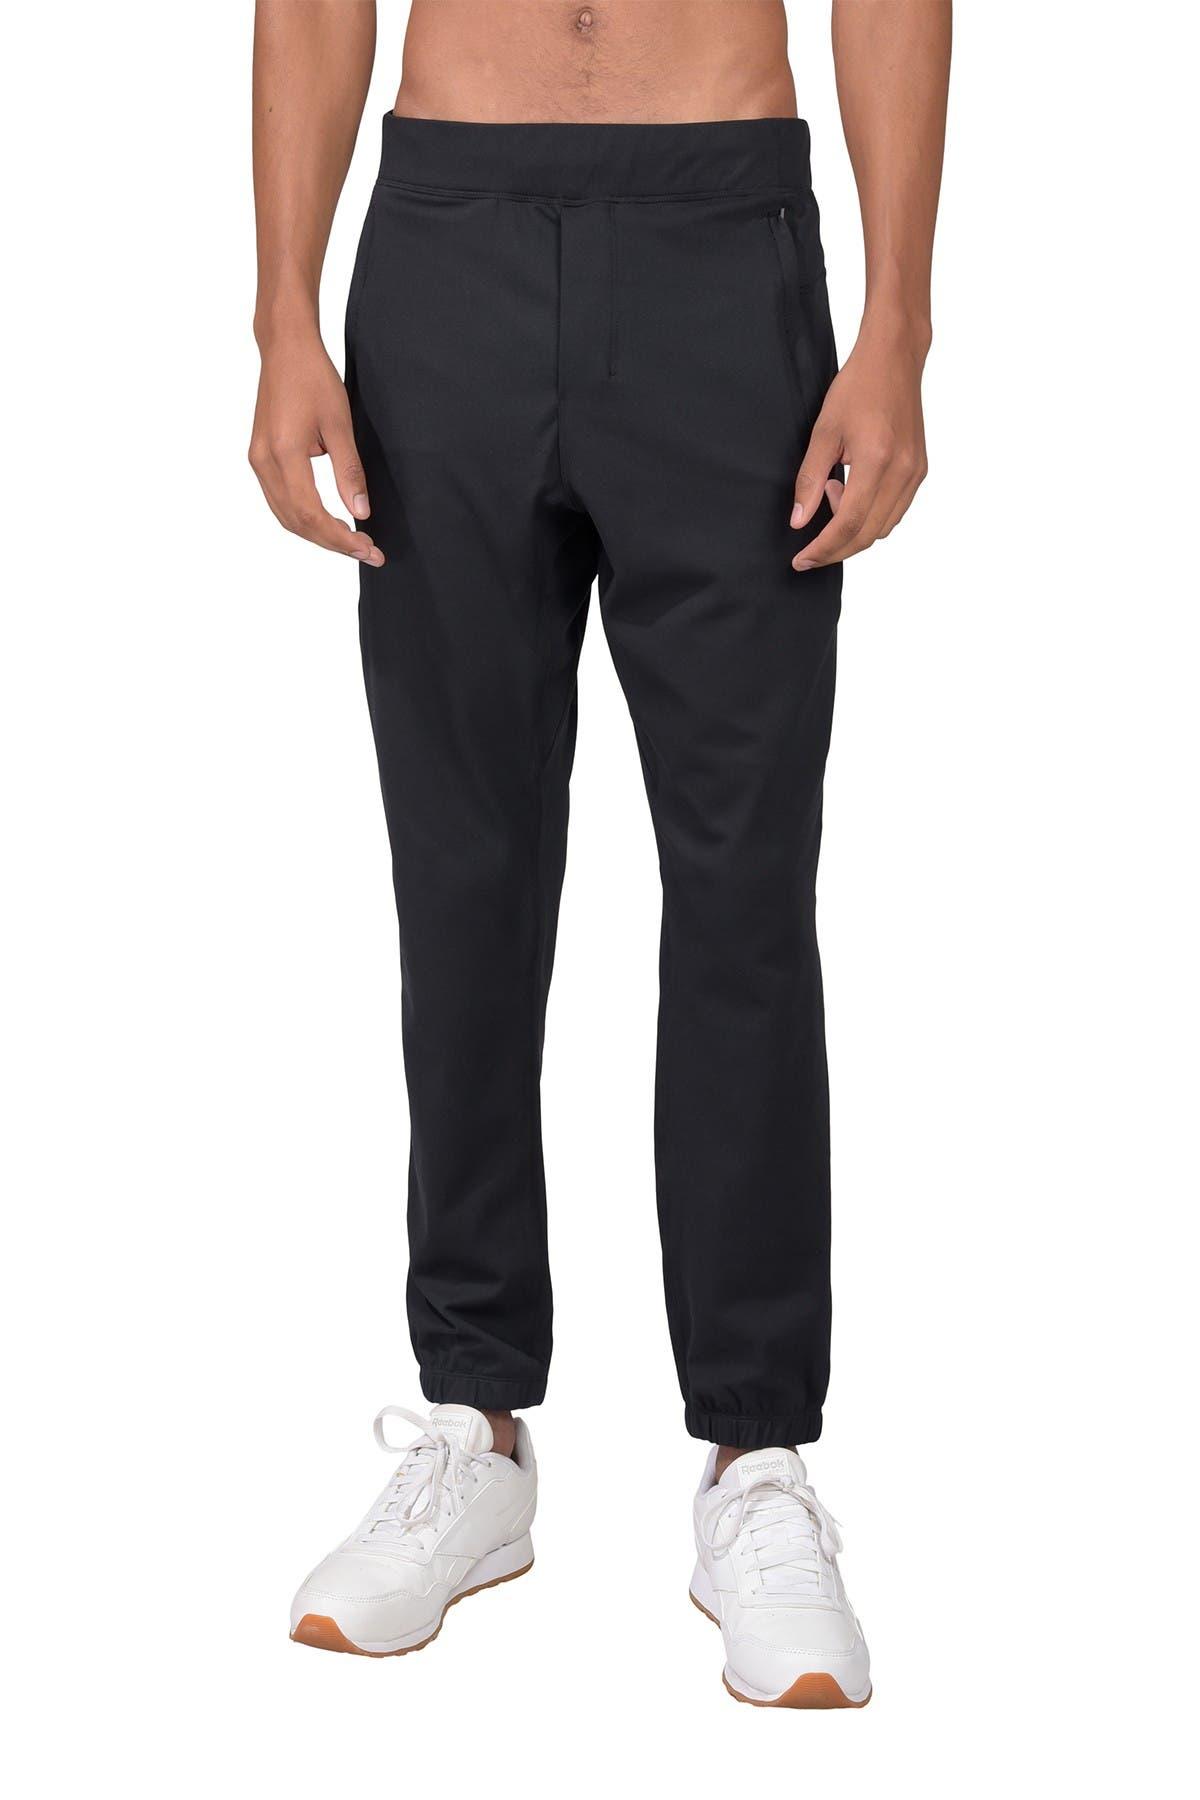 Image of 90 Degree By Reflex Interlock Zip Pocket Jogger Pants